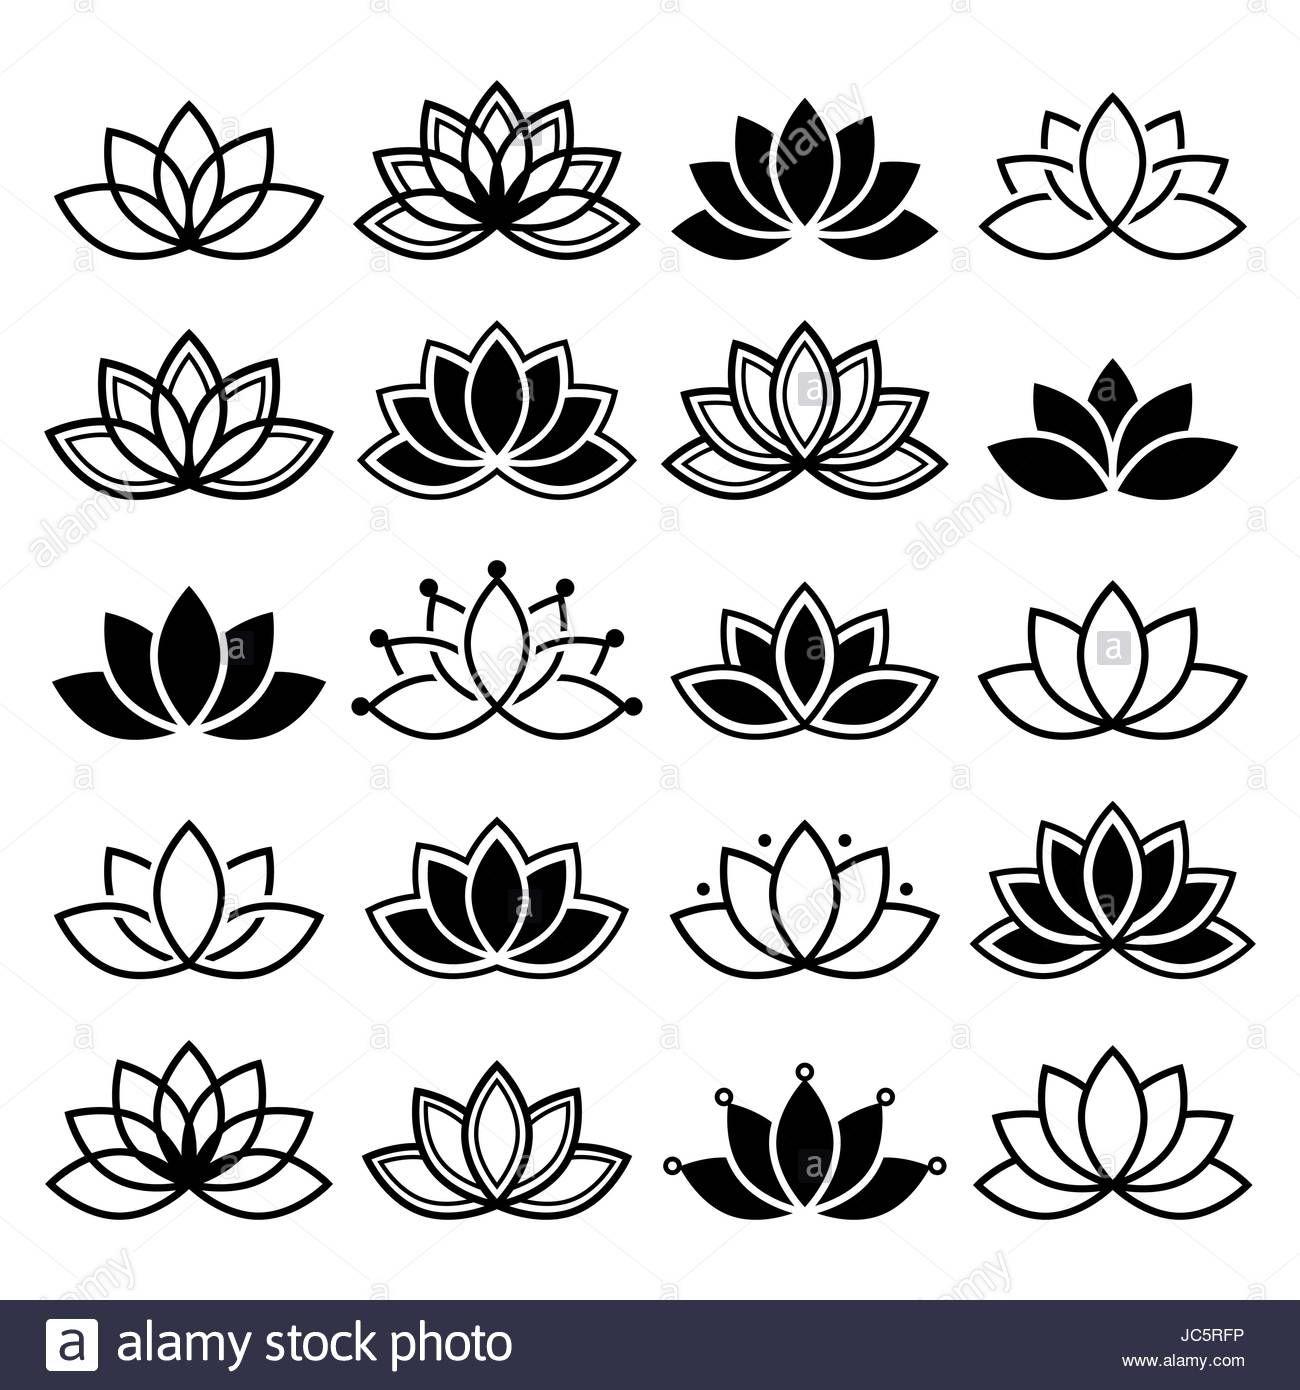 3 Petals Lotus Flower Clipart Google Search Stencils Lotus